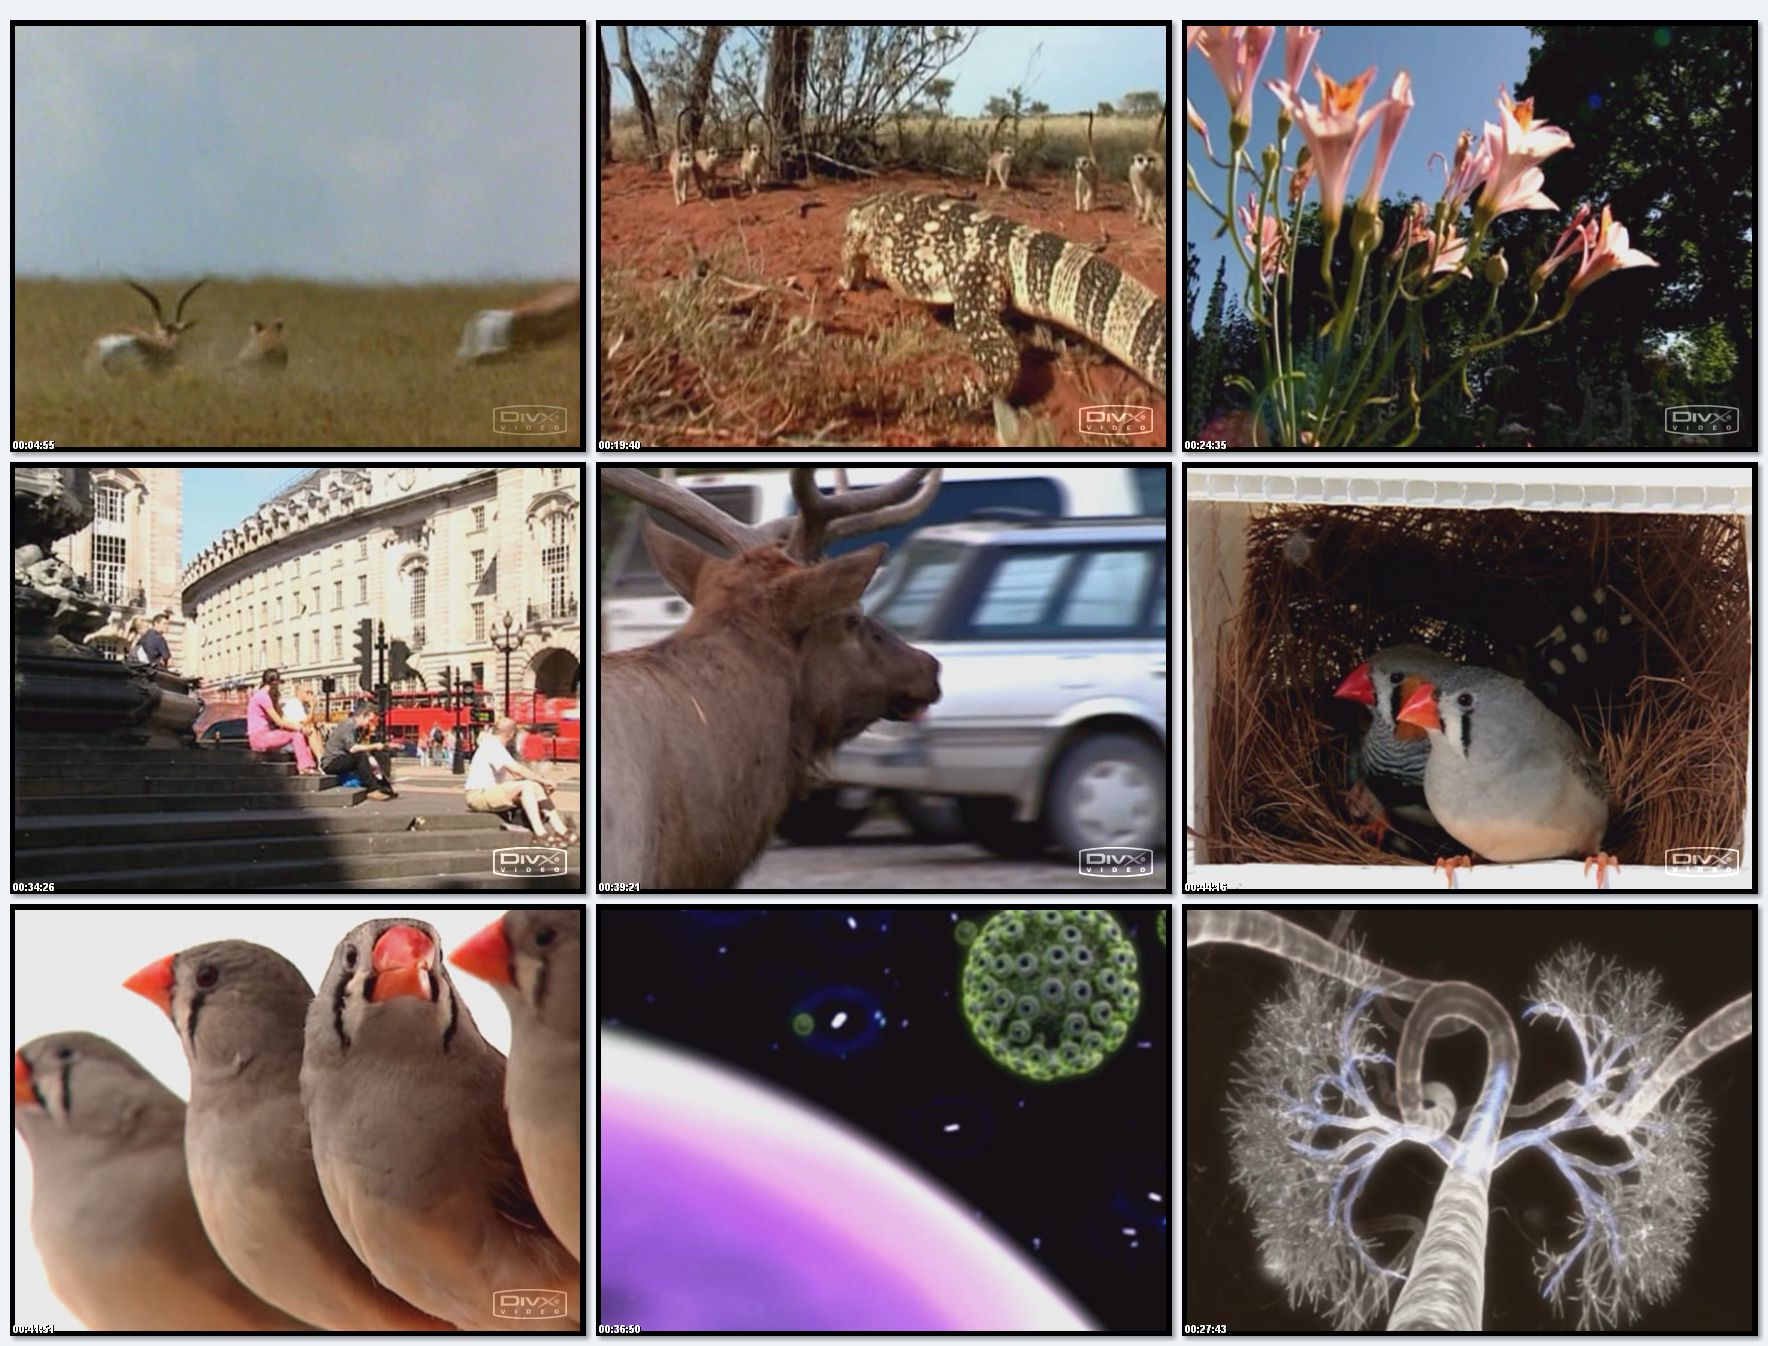 BBC: Эволюция Жизни. Жизнь вместе (фильм 4) / BBC: Journey Of Life